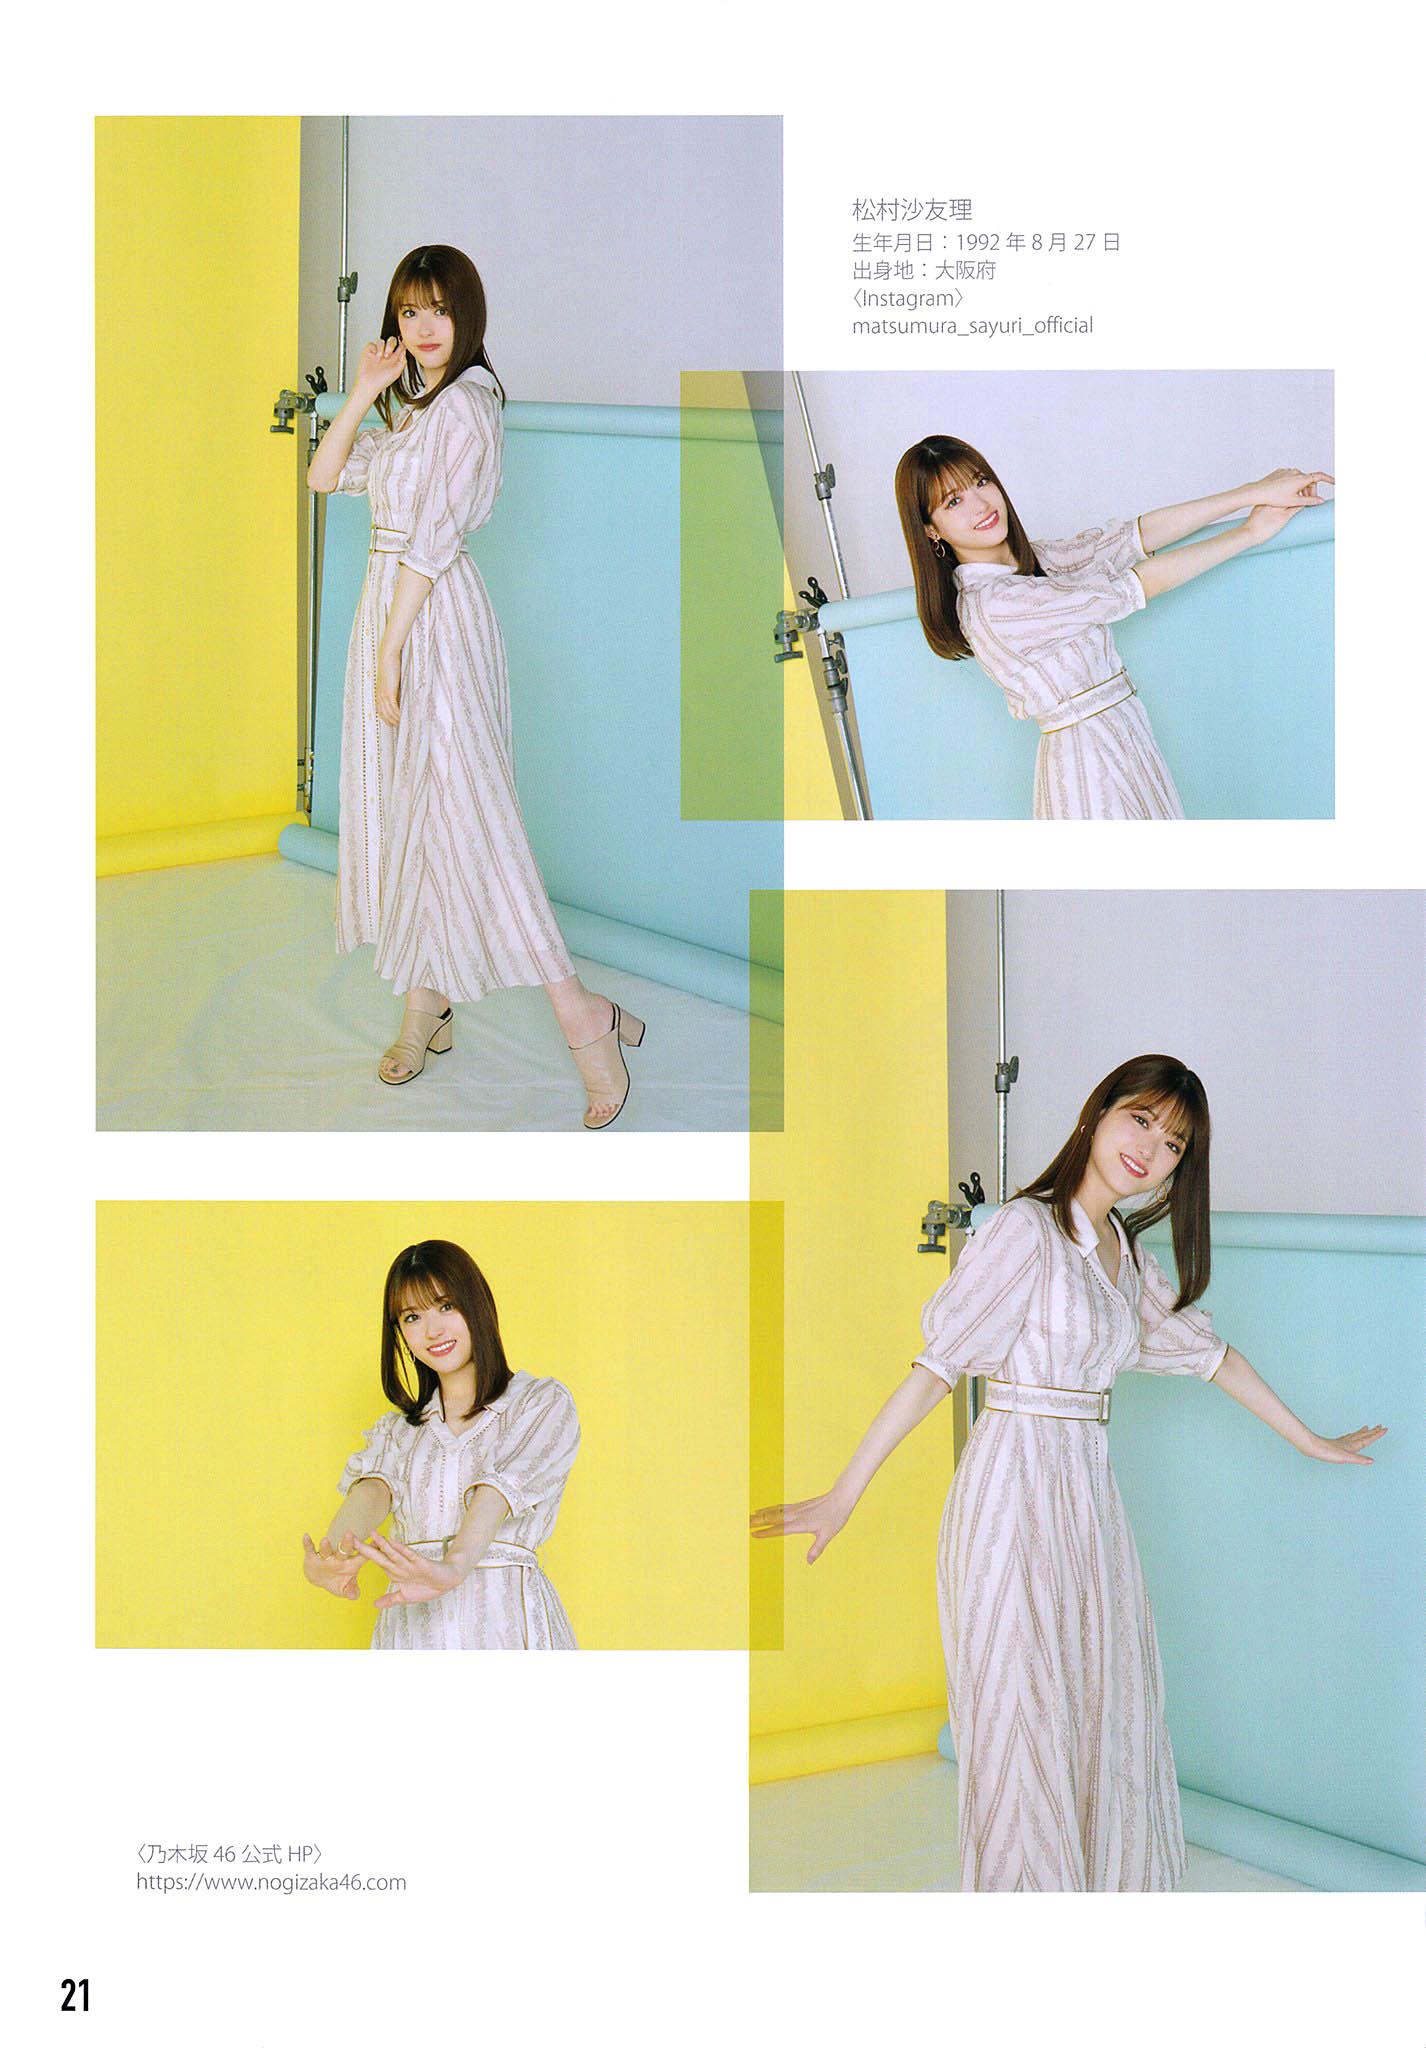 EIkuta SMatsumura Big One Girls 2105 08.jpg